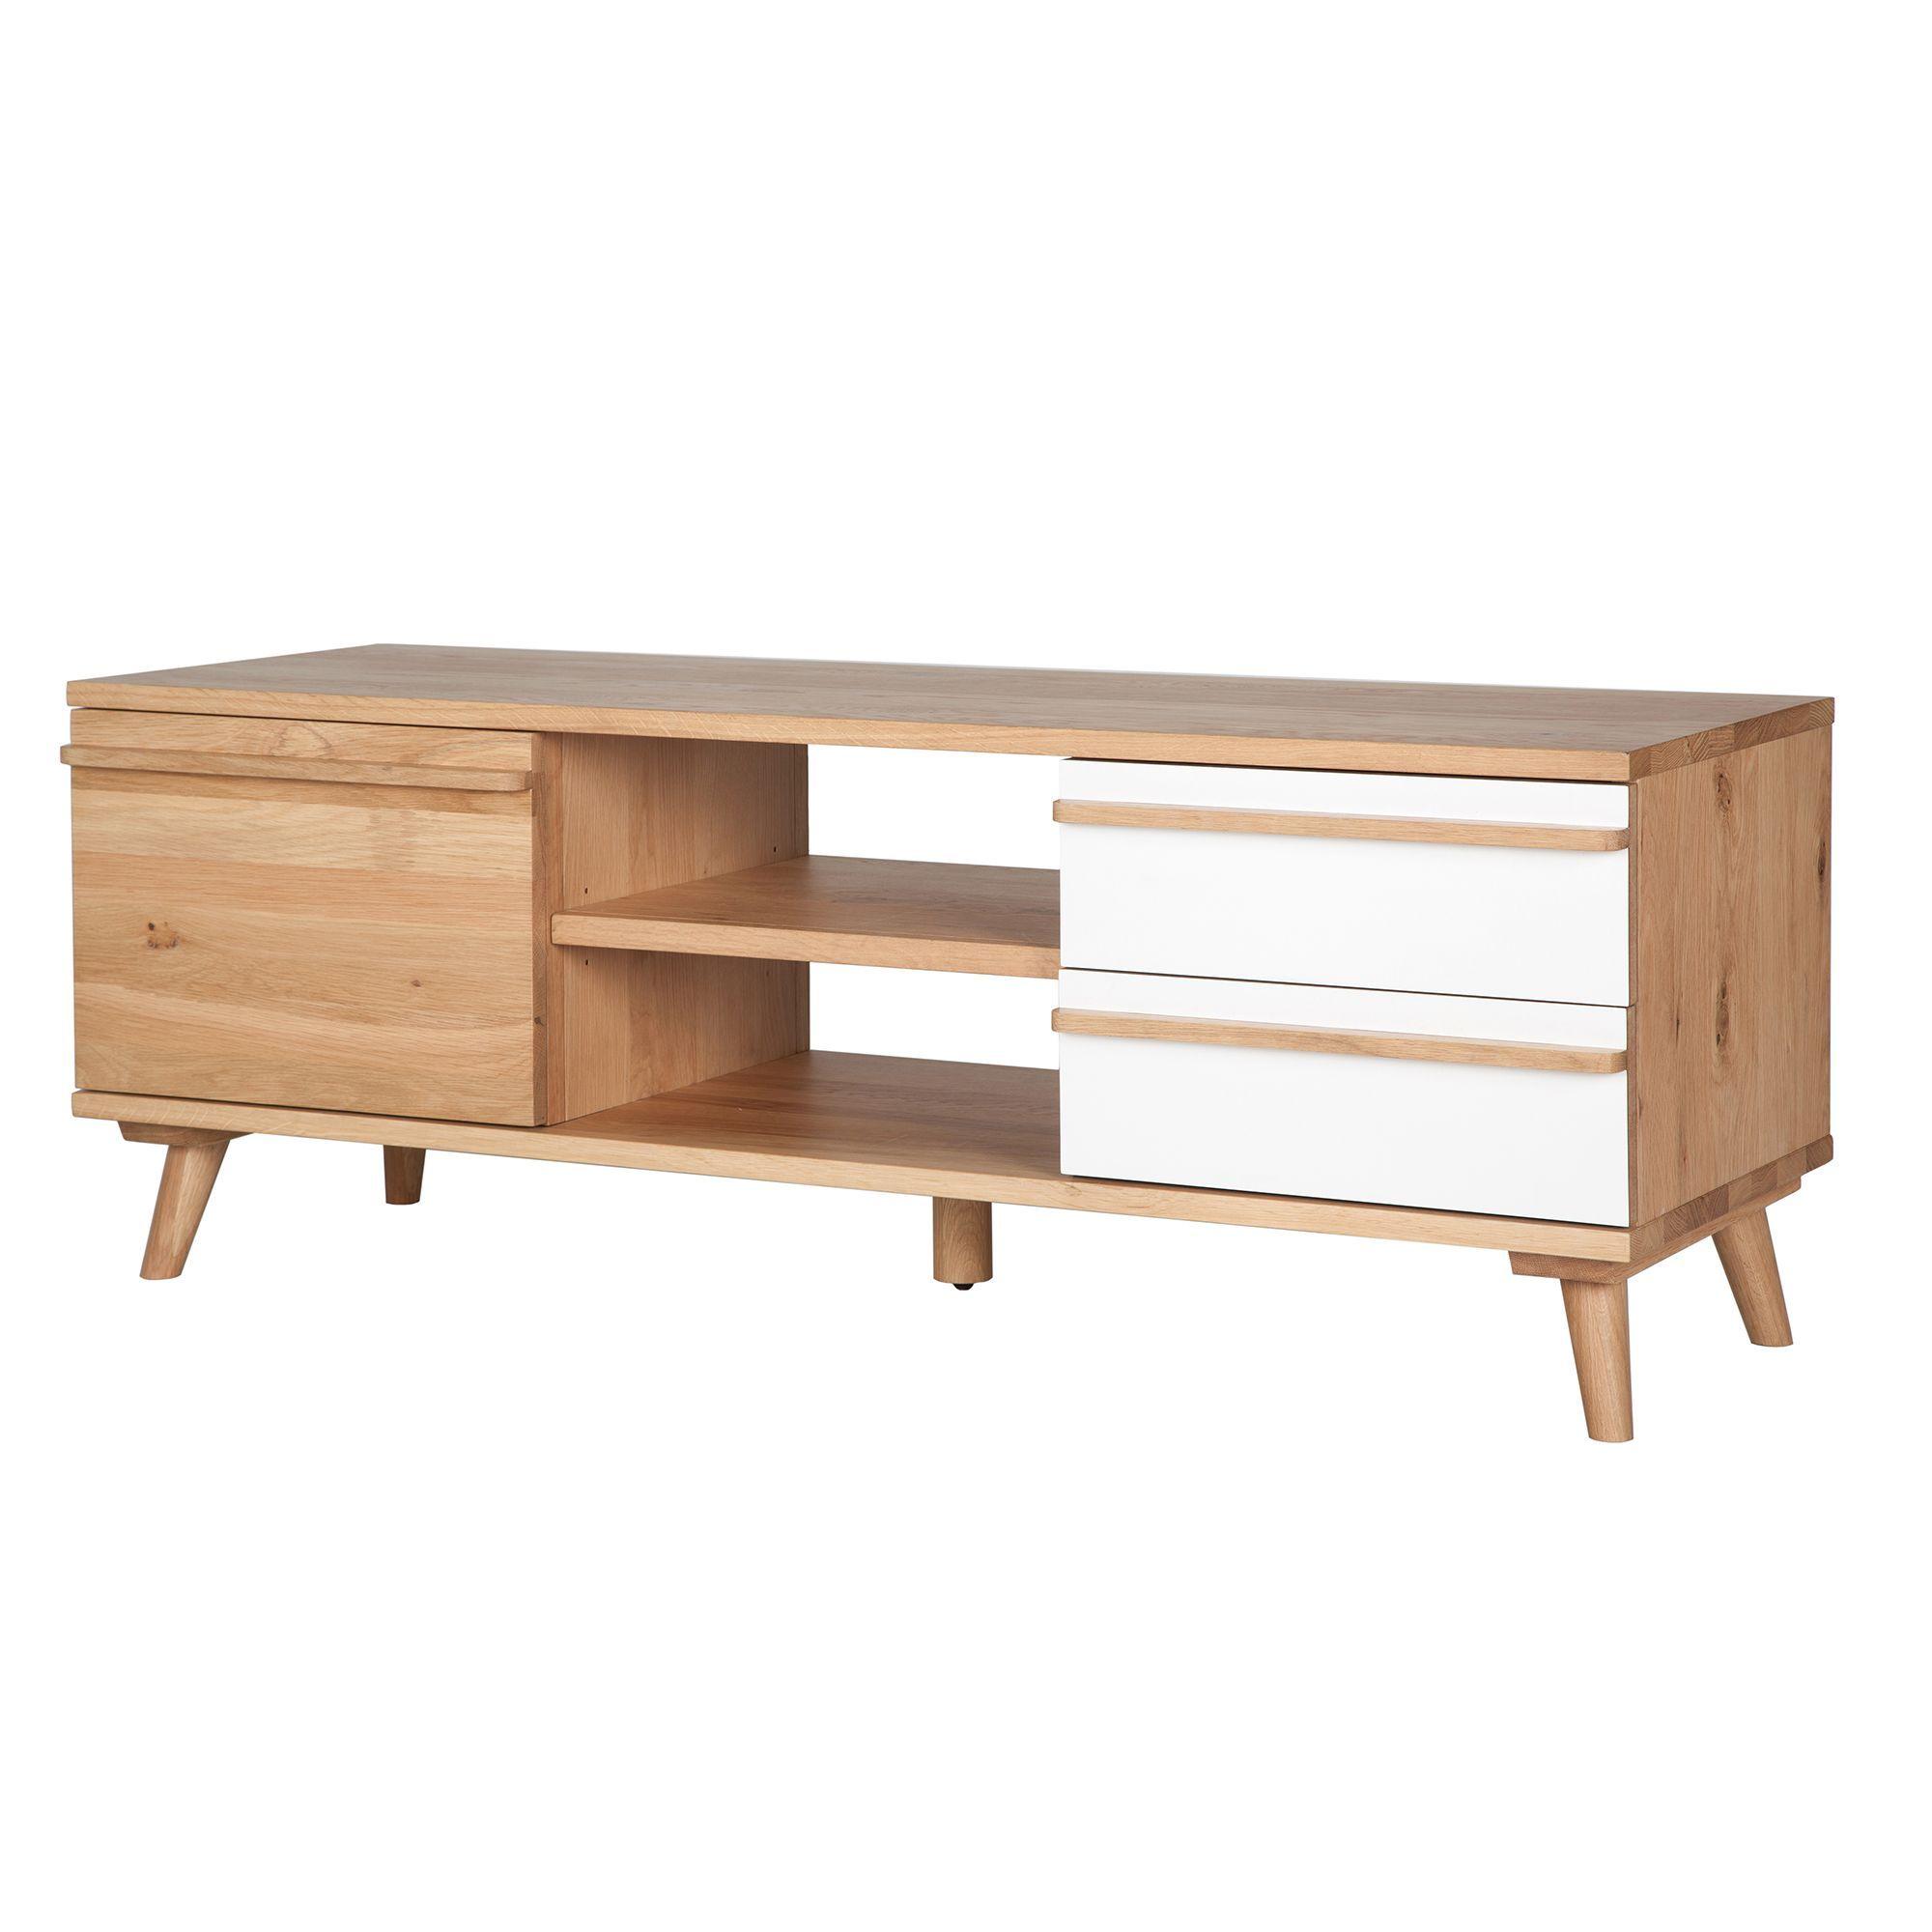 meuble tv 1 porte et 2 tiroirs ch ne et formica naturel skandy alin a 459euros longueur. Black Bedroom Furniture Sets. Home Design Ideas